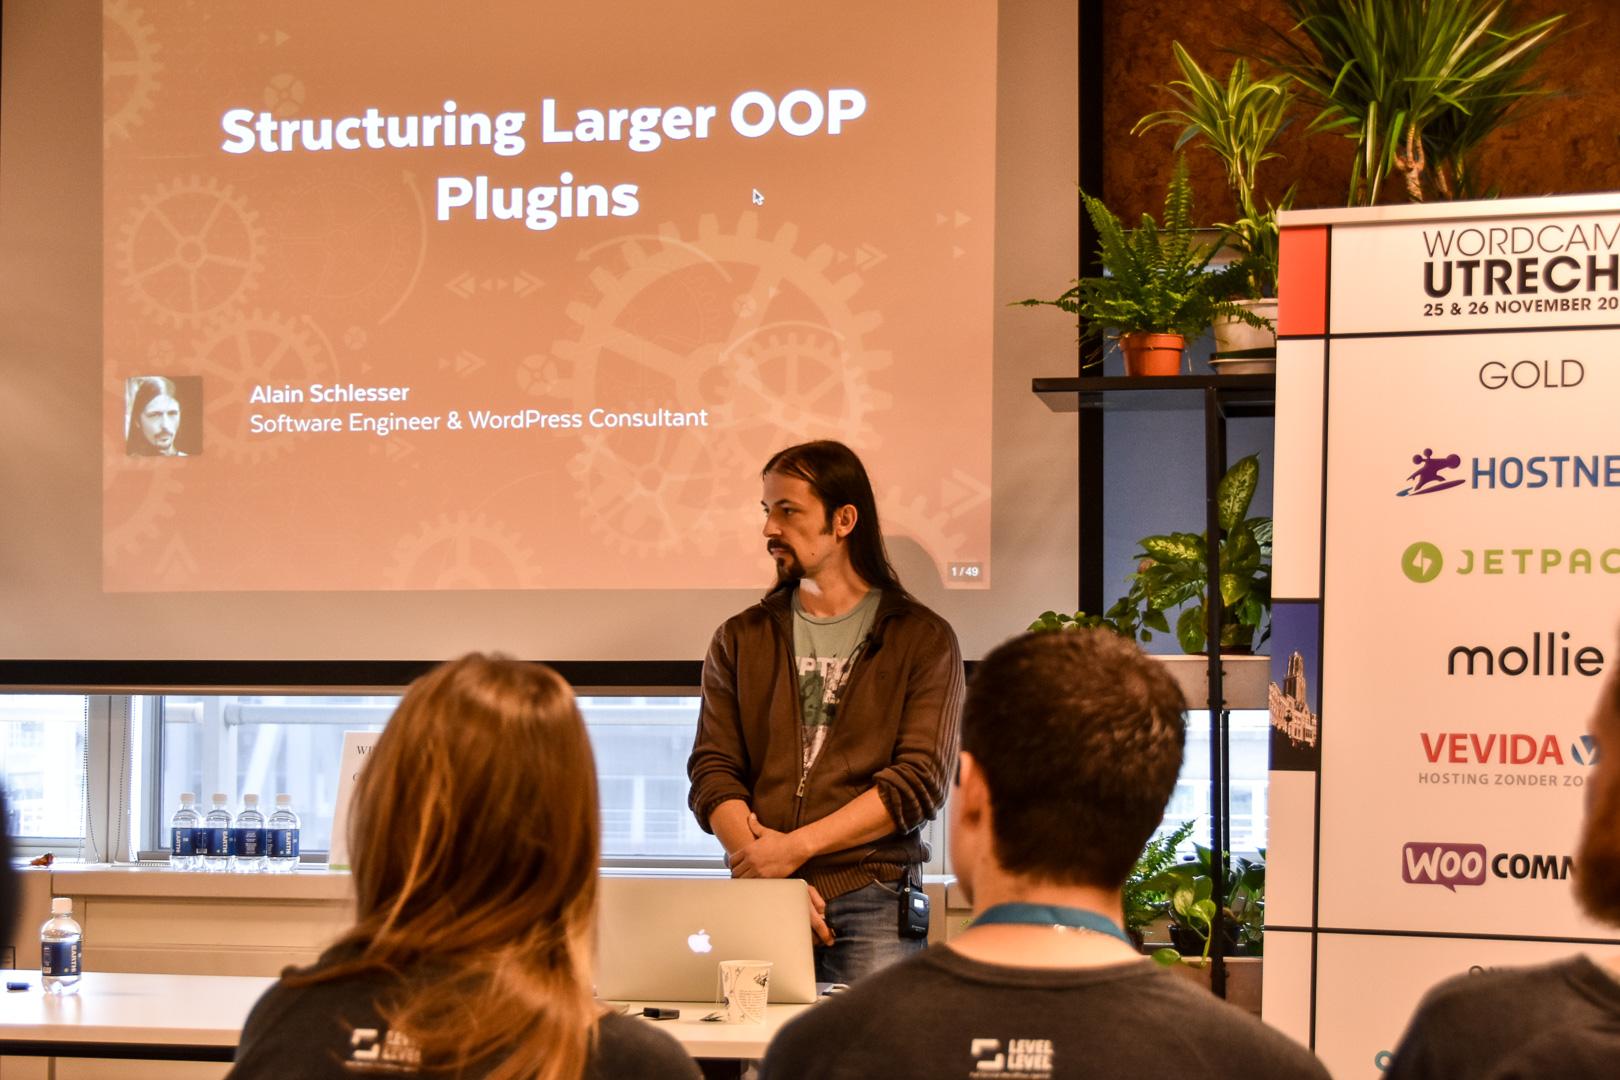 WordCamp Utrecht, Alain Schlesser, speaker